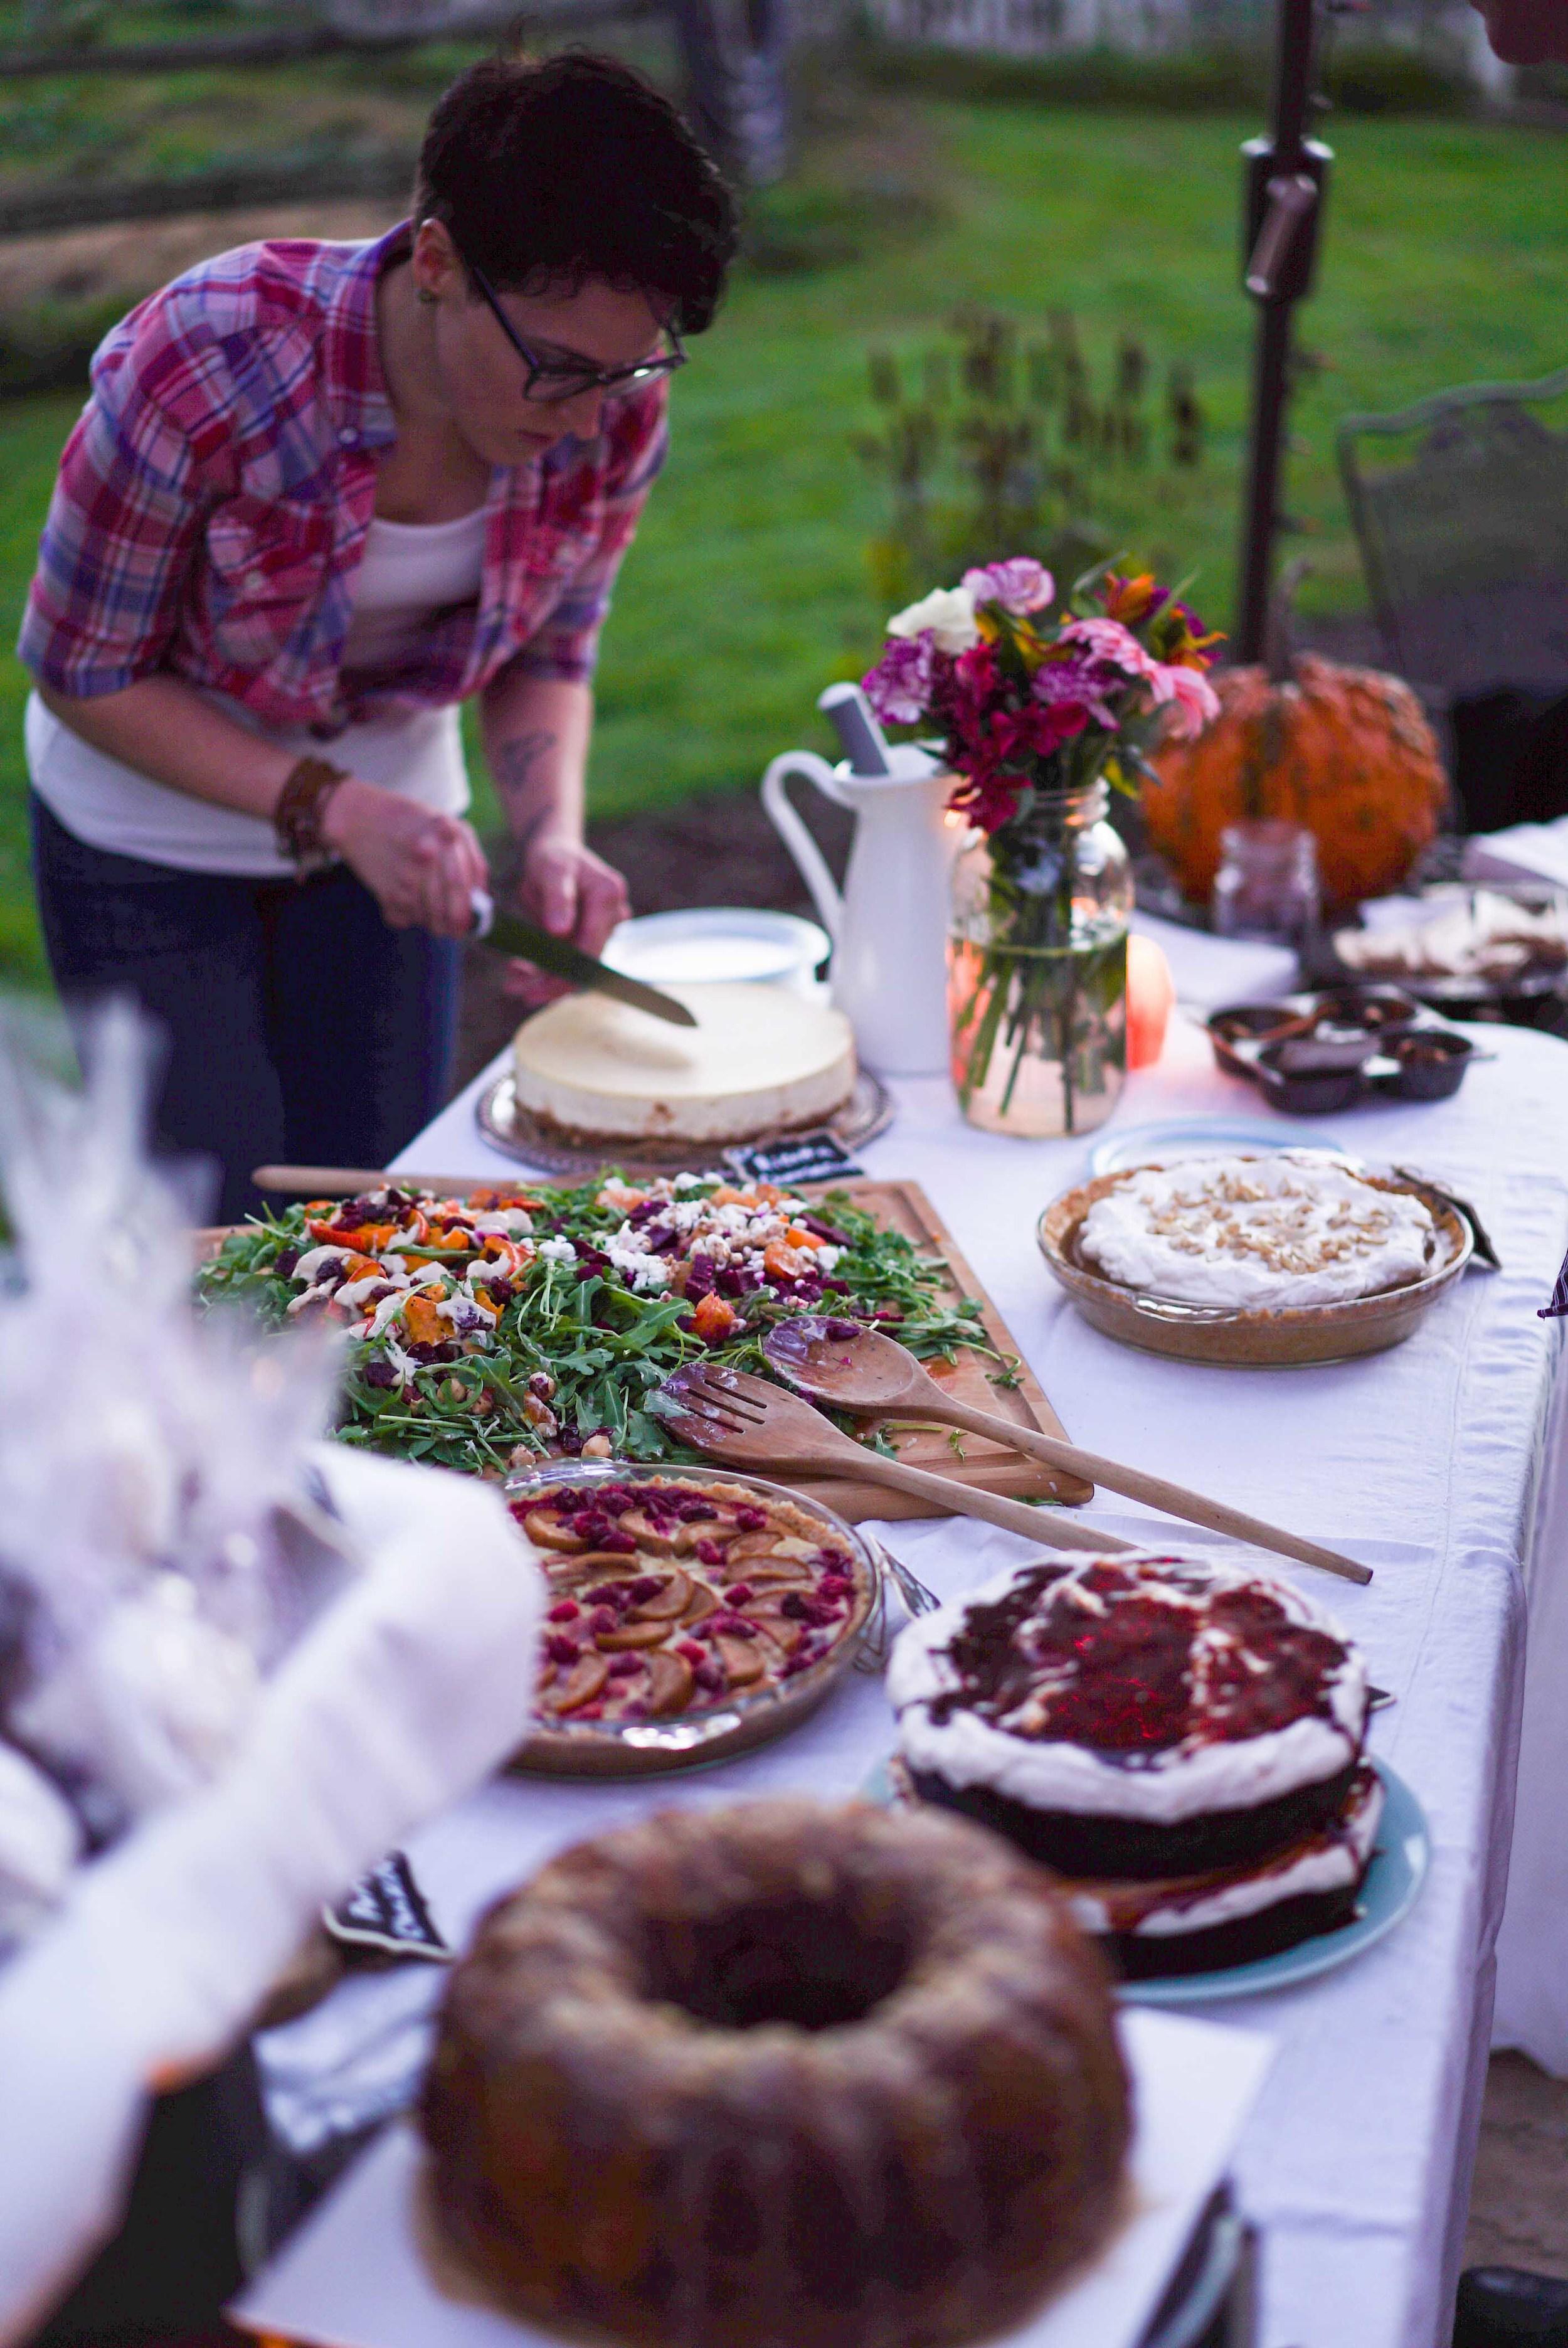 philadelphia_photographer_wedding_event8.jpg